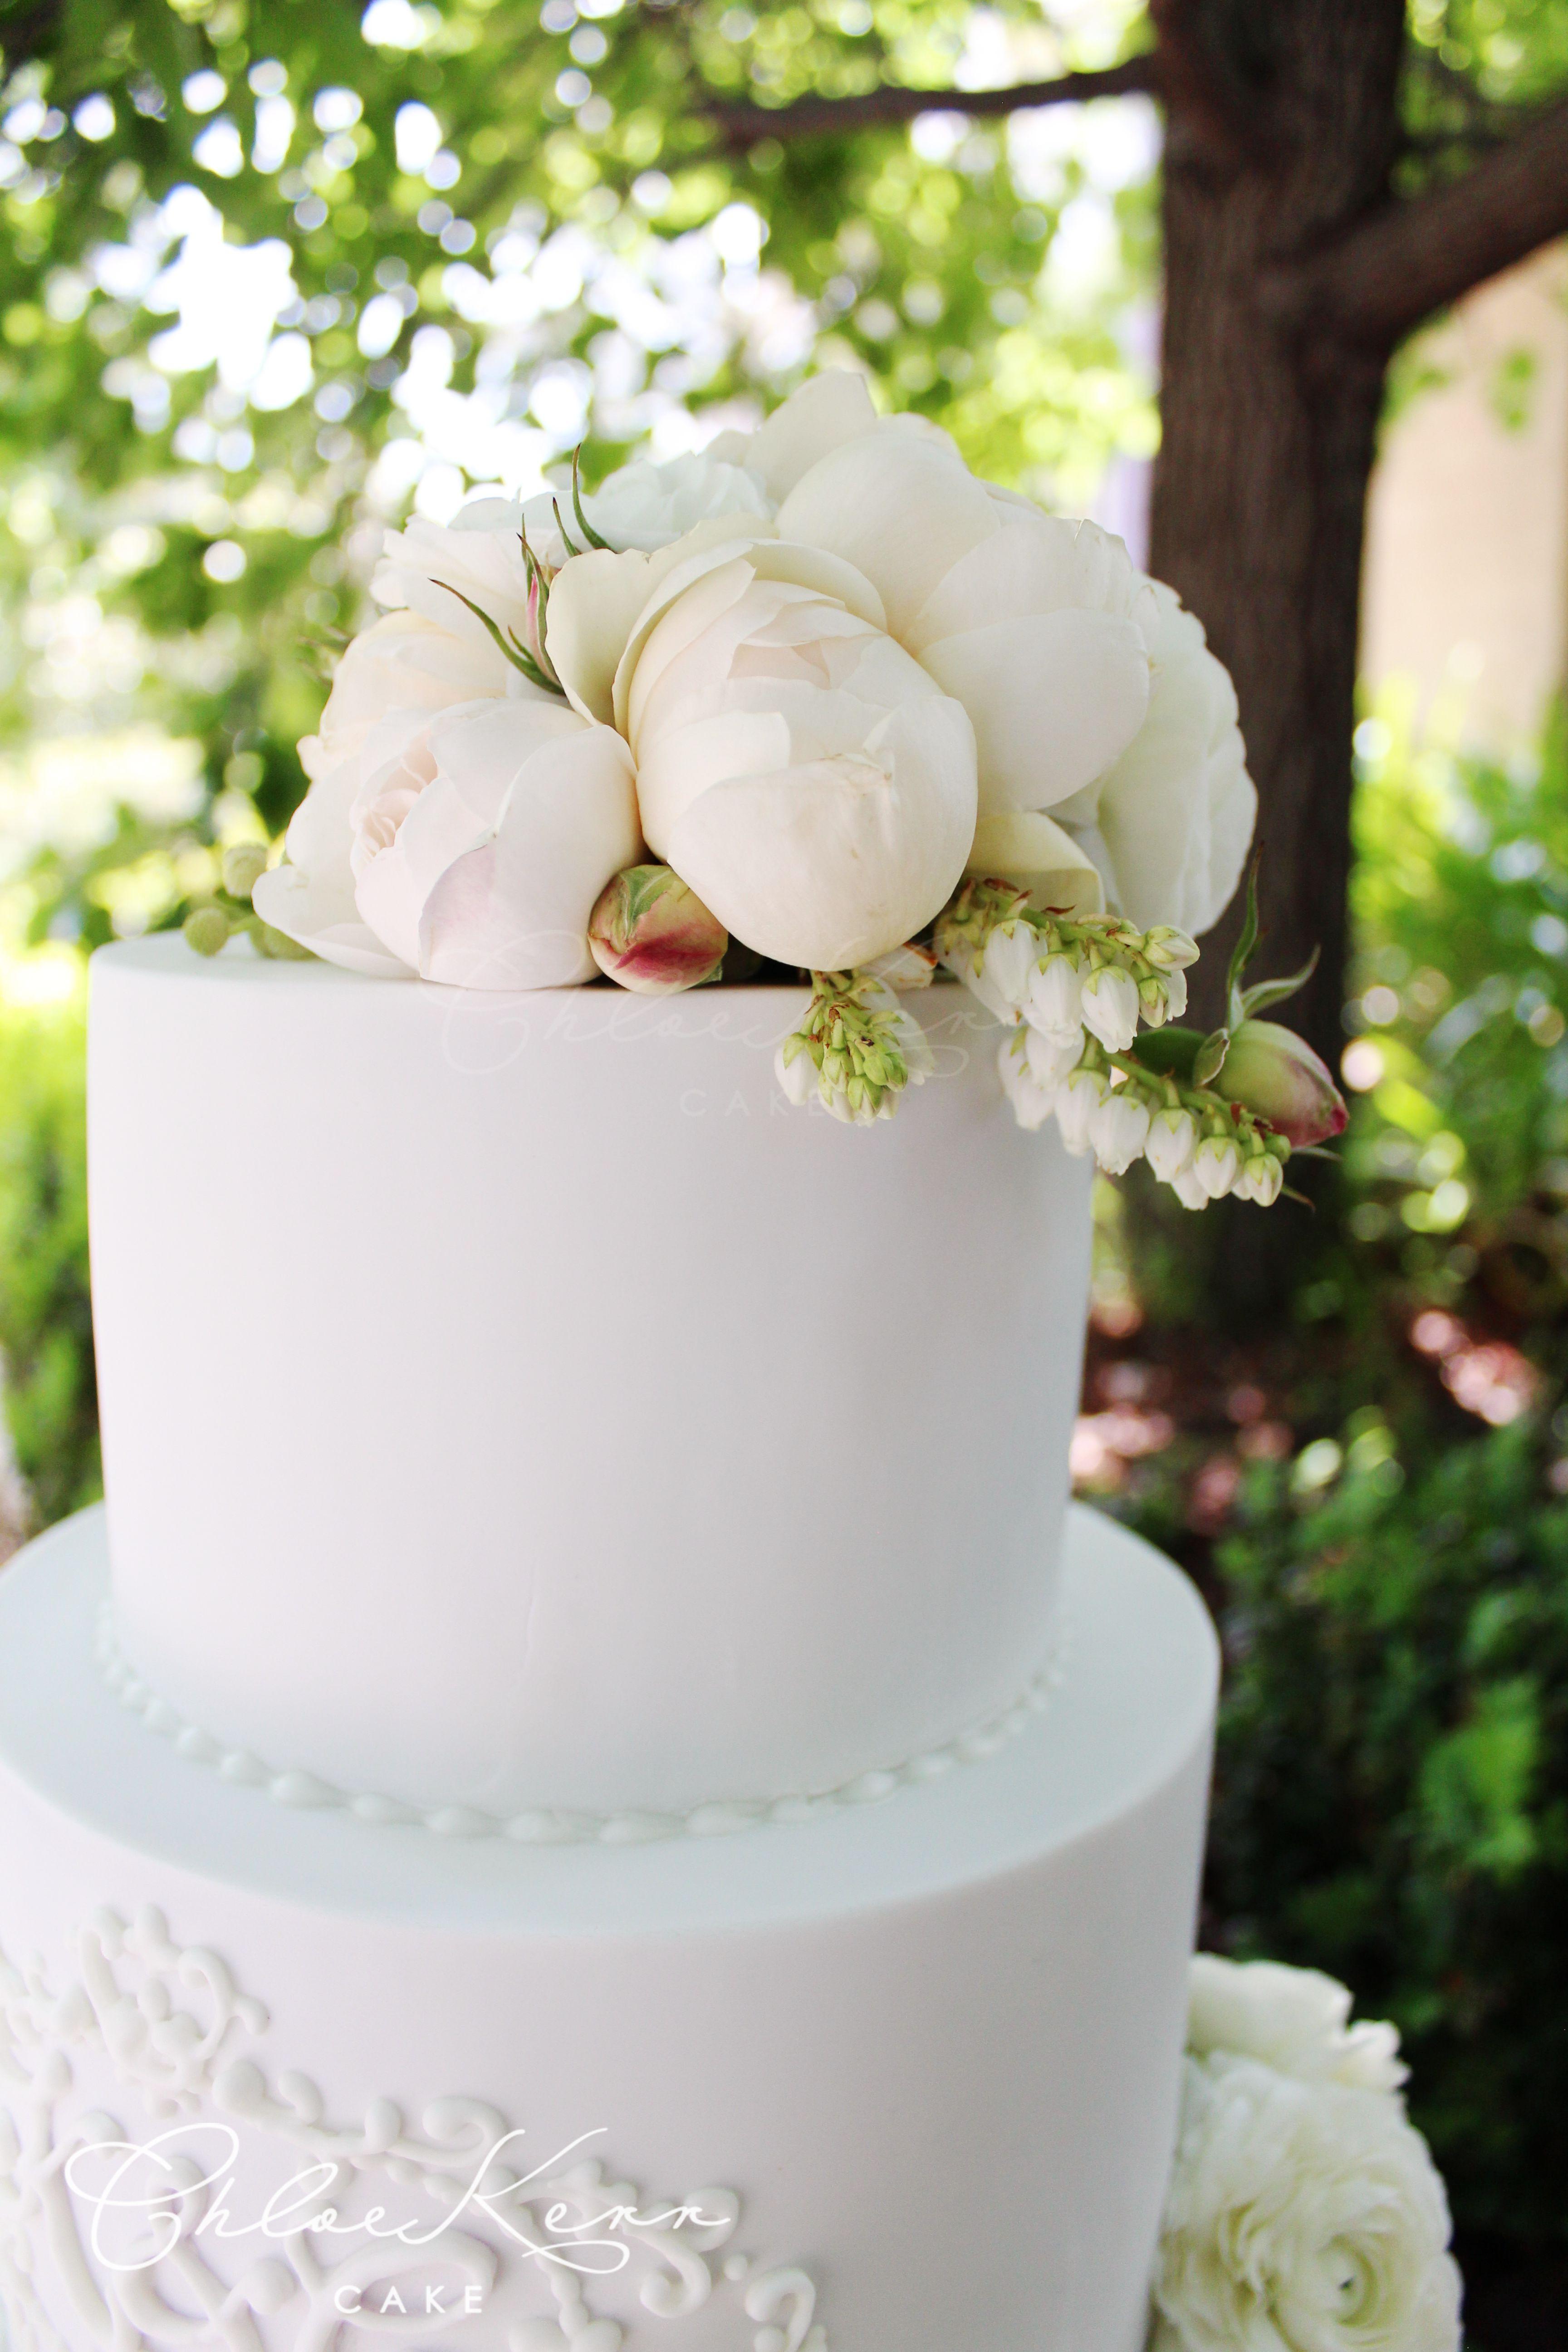 Fondant Cakes -tradition by Chloe Kerr Cake   Bridestory.com